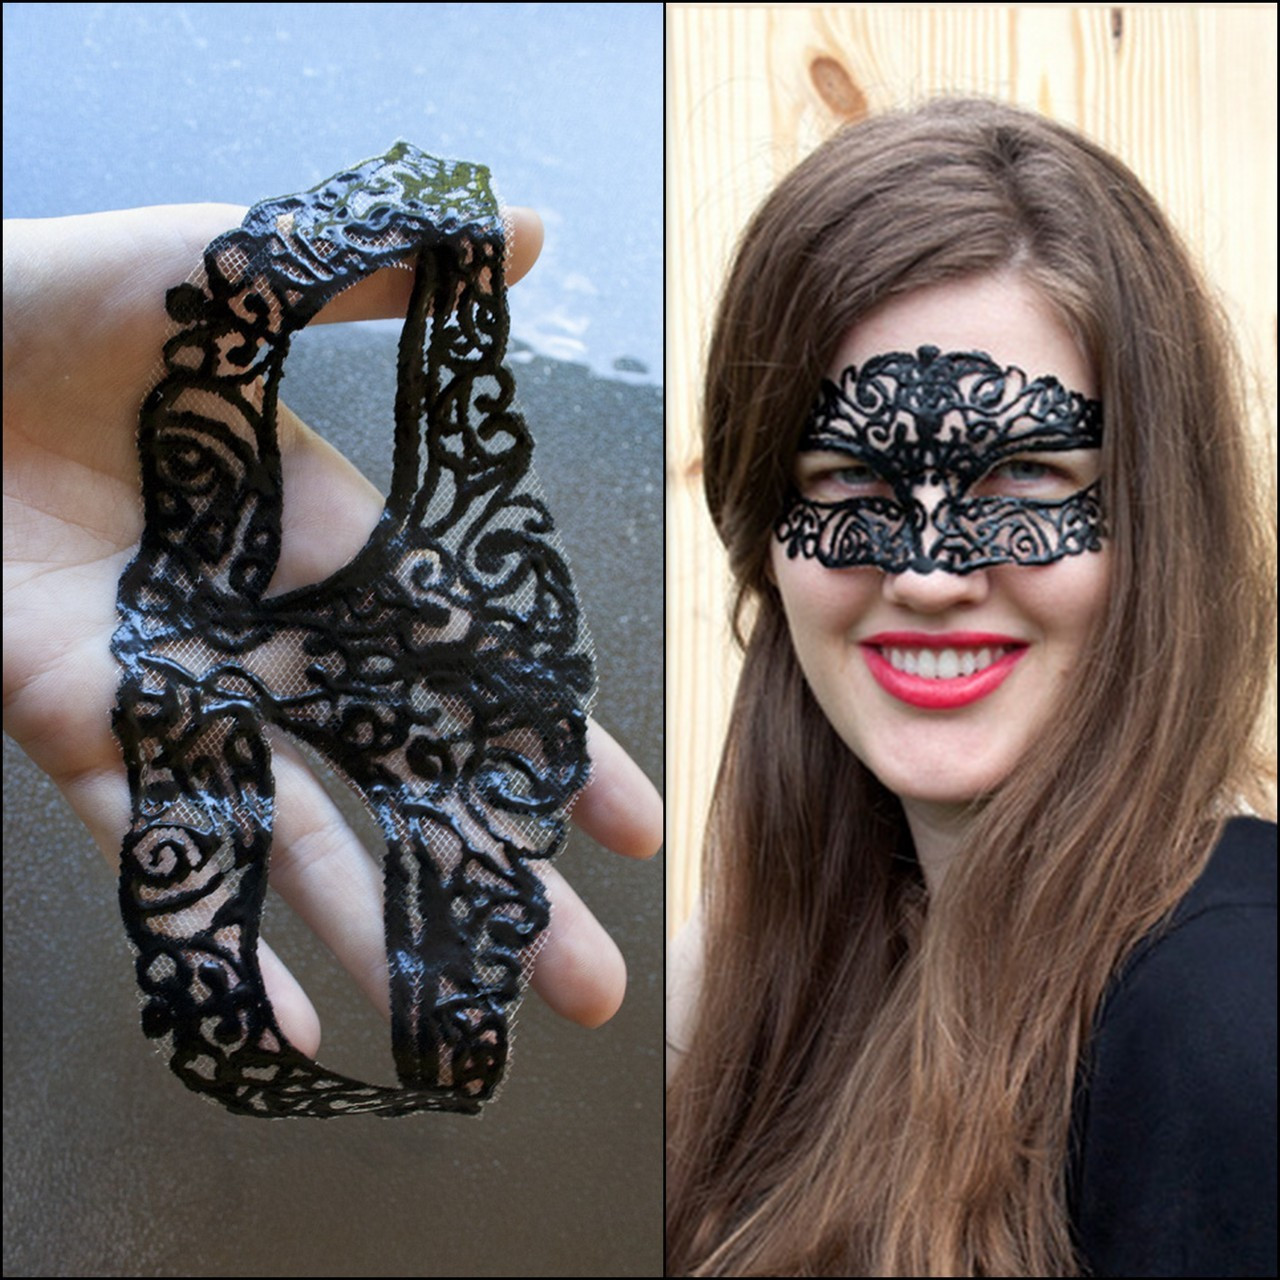 Best ideas about Masquerade Masks DIY . Save or Pin True Blue Me & You DIYs for Creatives • DIY Masquerade Now.